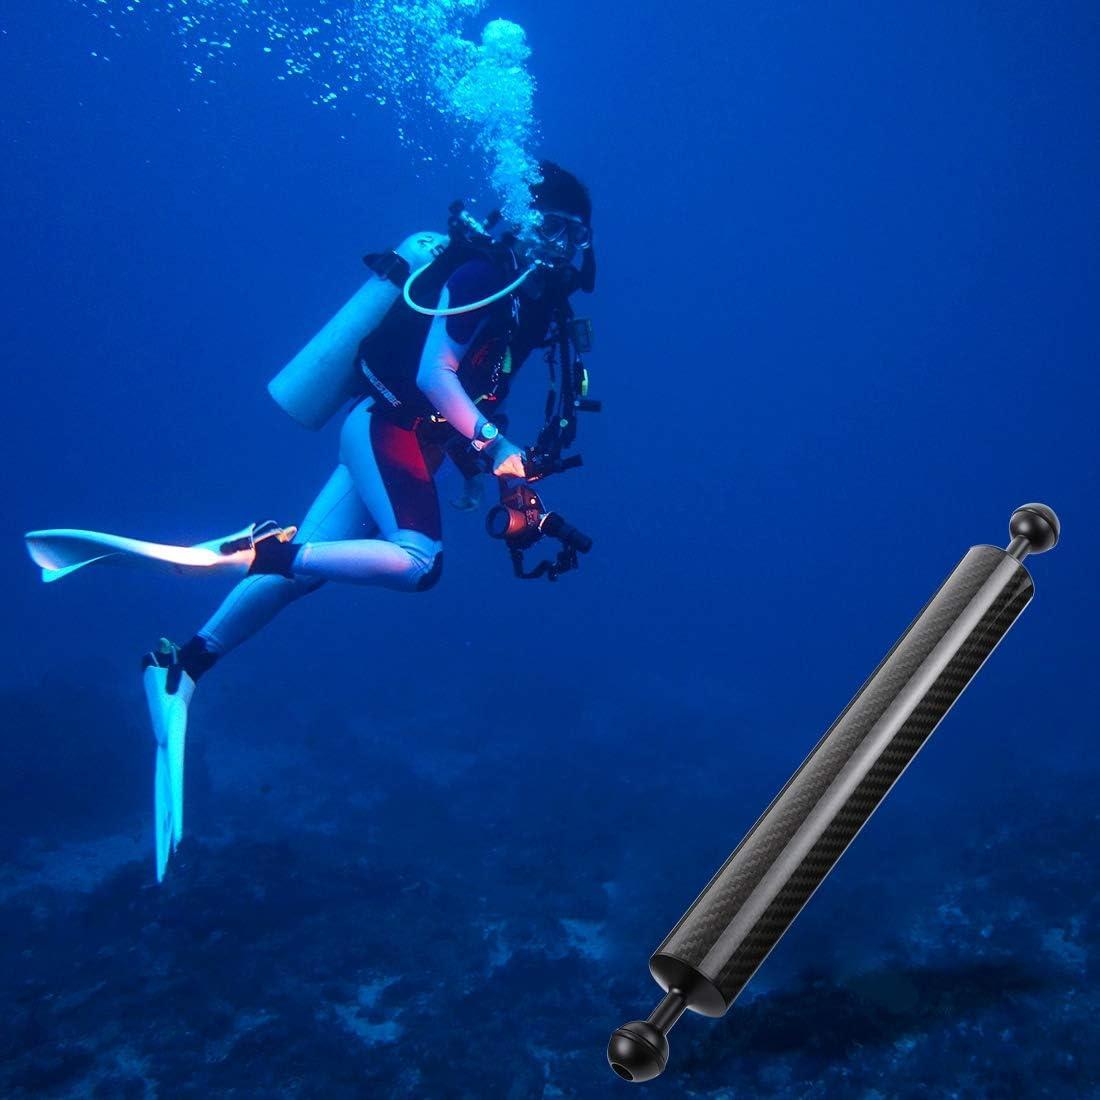 300g Durable 25mm Ball Diameter GuiPing 14.56 inch 37cm Length 40mm Diameter Dual Balls Carbon Fiber Floating Arm Buoyancy